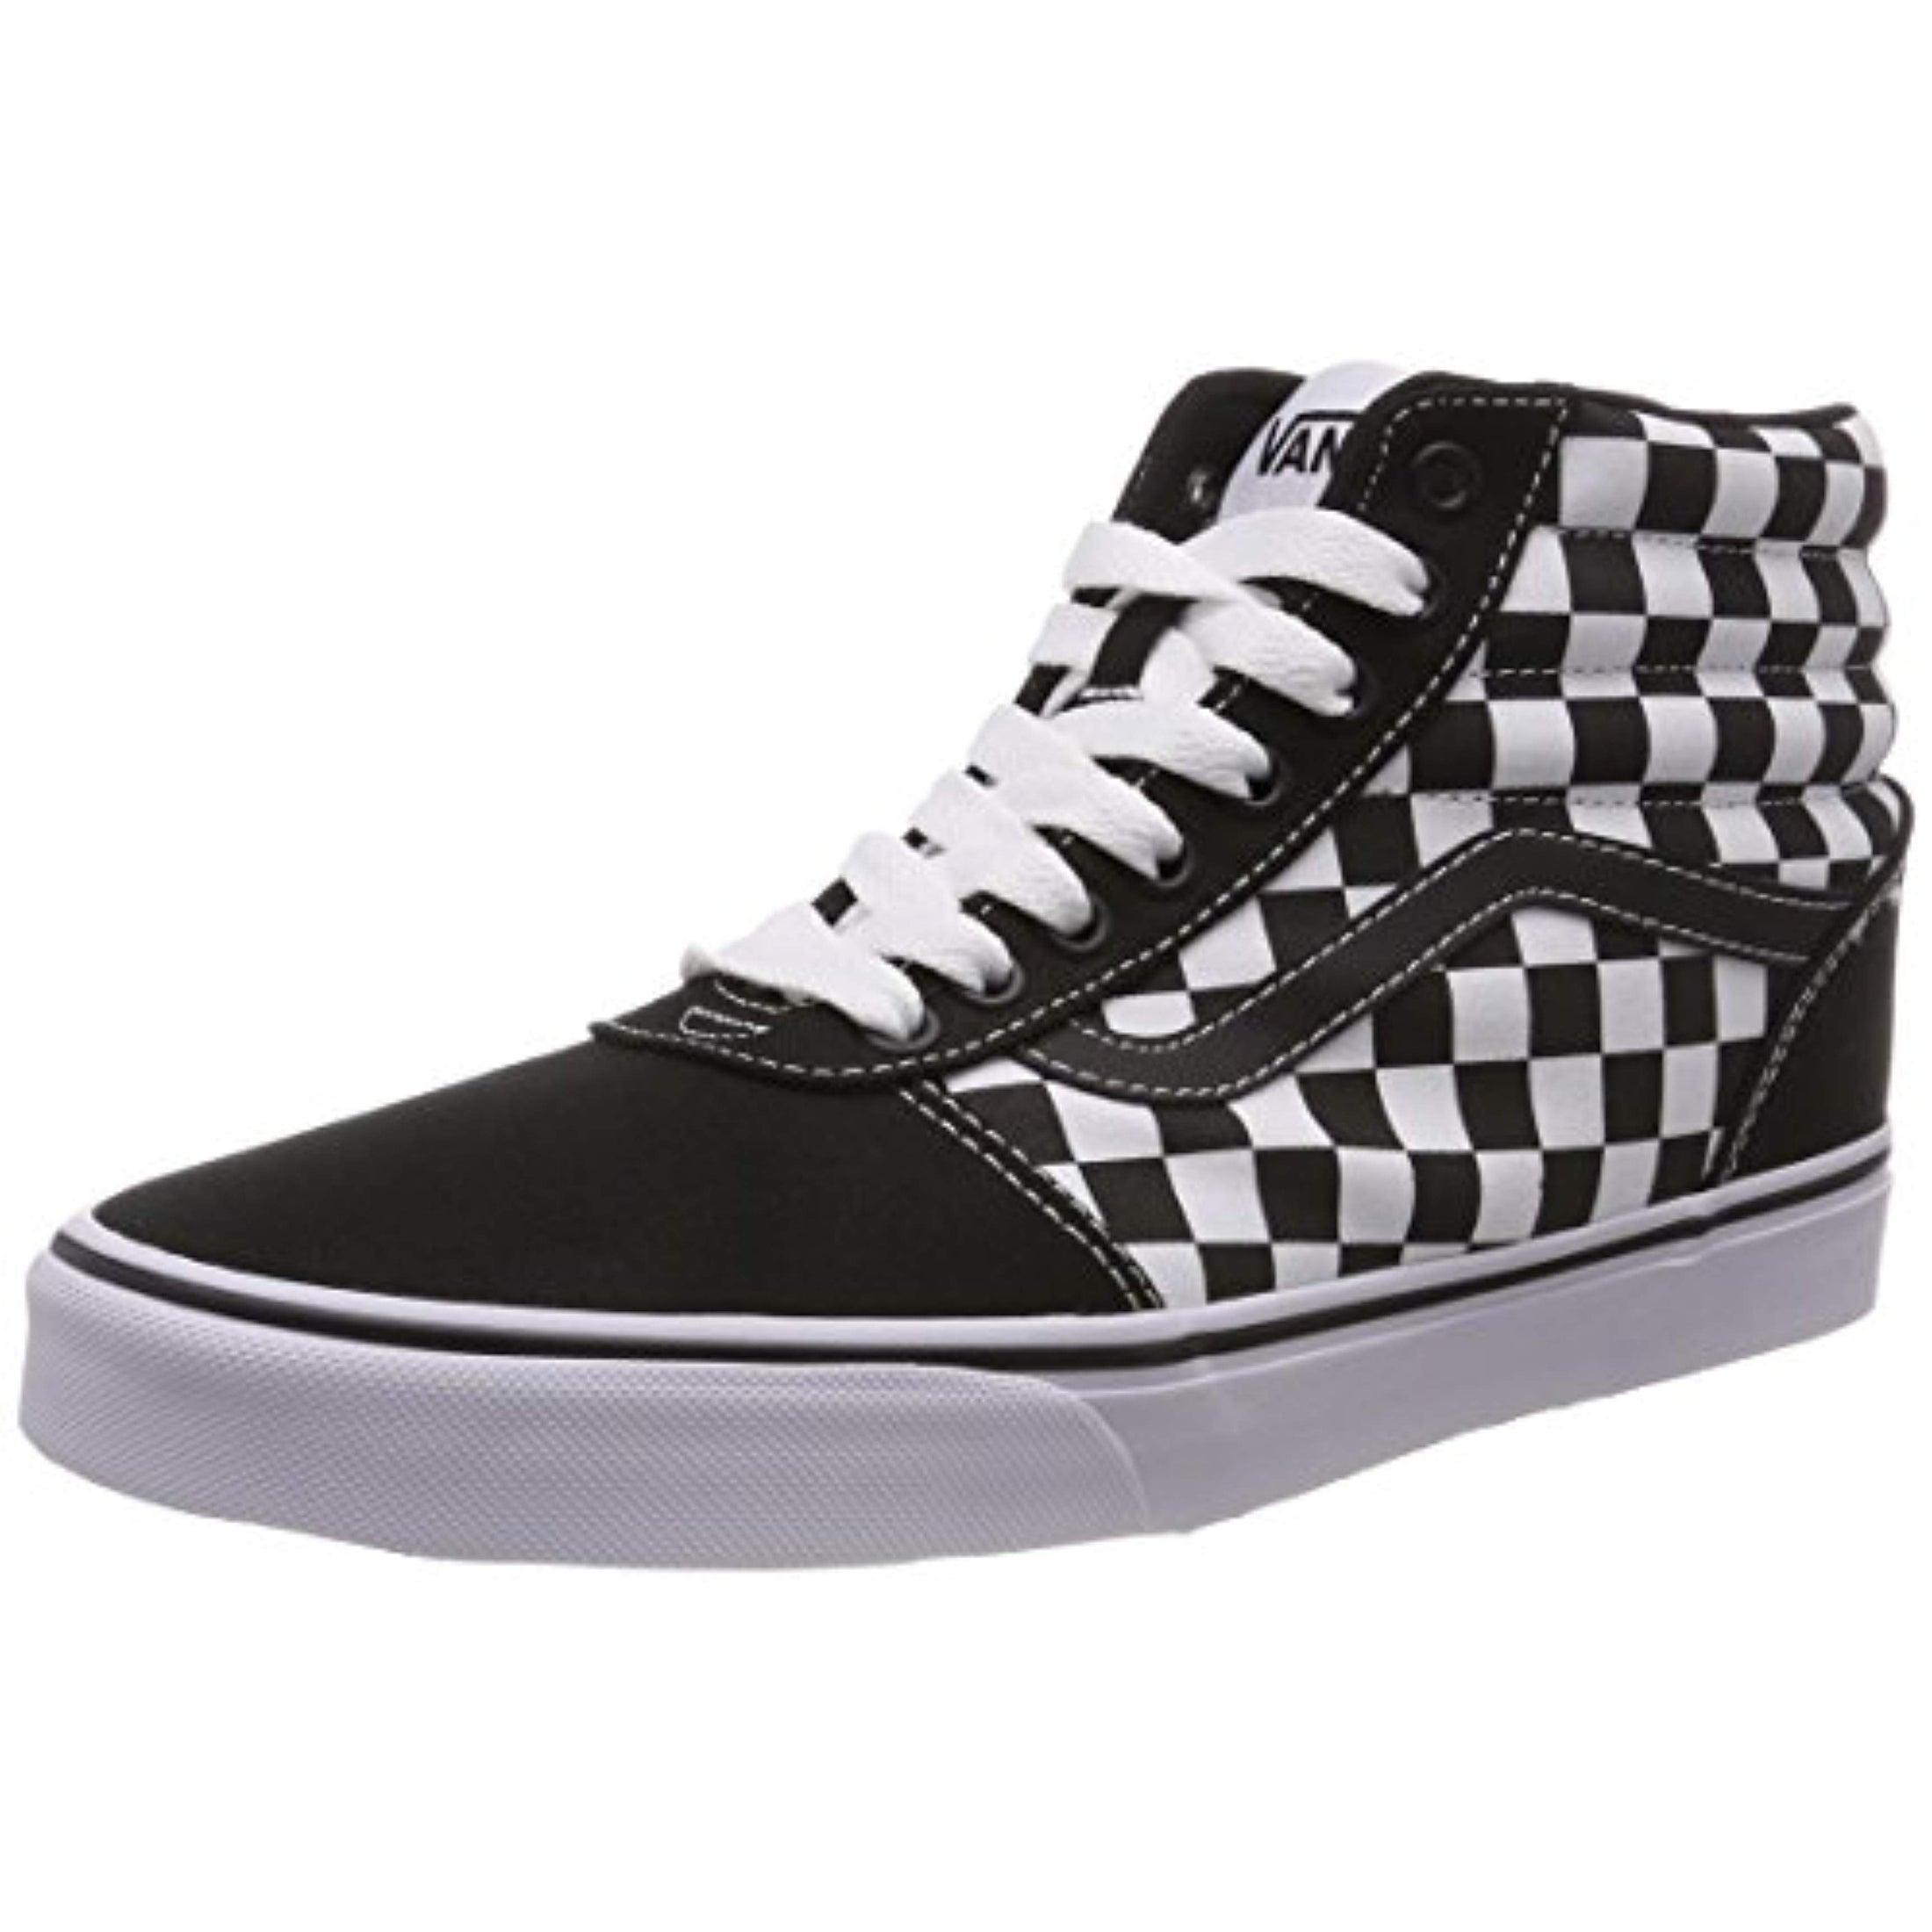 mens high top checkered vans